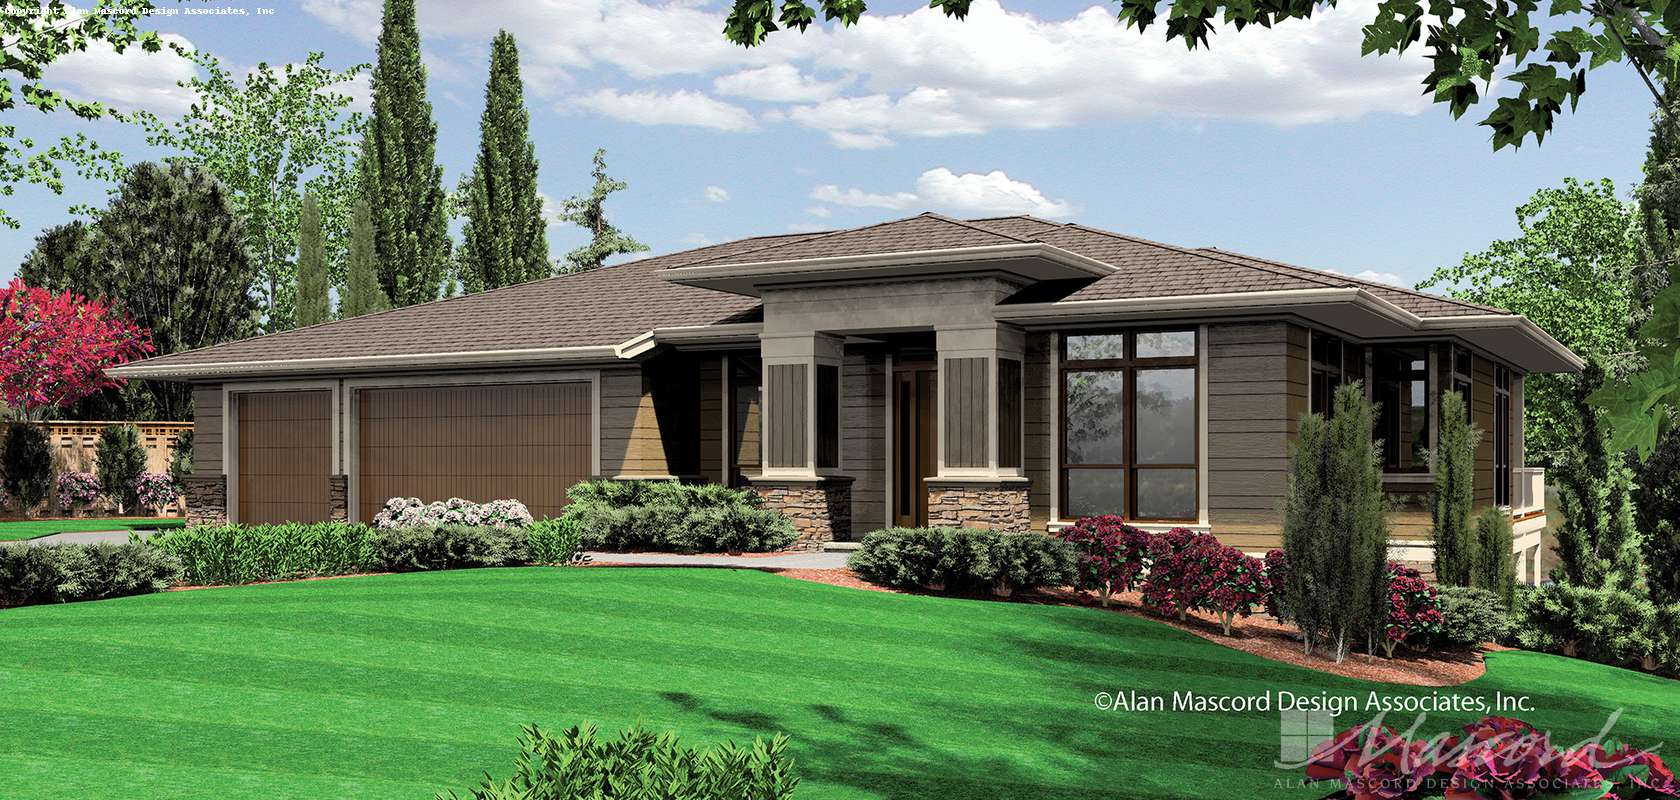 Mascord House Plan 1320A: The Kendrick